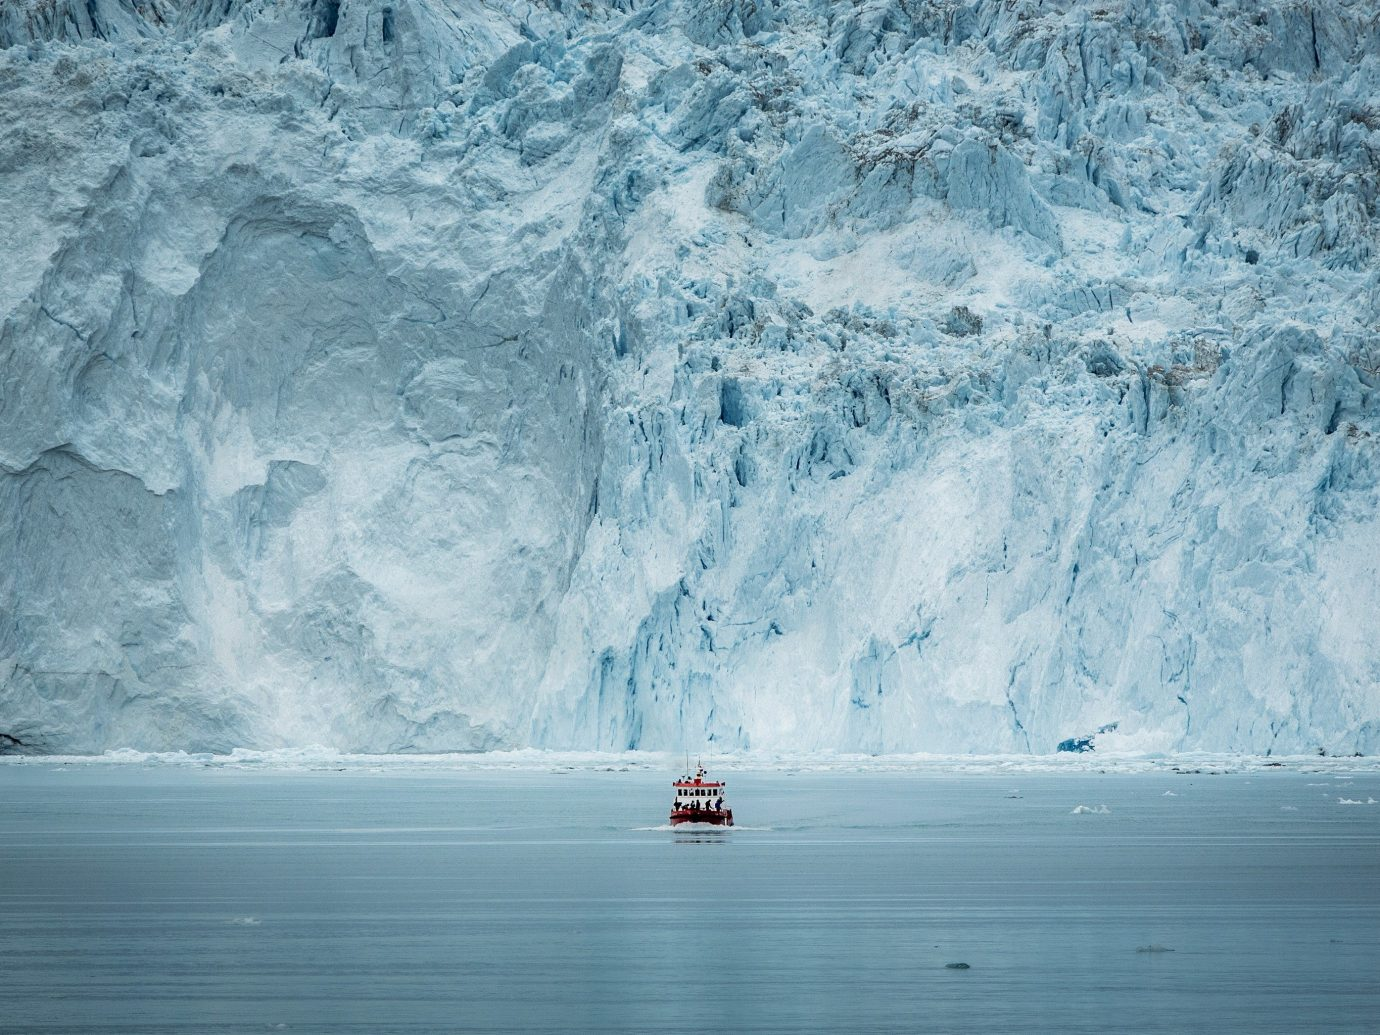 Trip Ideas water outdoor ice landform geographical feature Nature glacier arctic glacial landform Ocean geological phenomenon freezing arctic ocean Sea wind wave ice cap ice cave iceberg wave